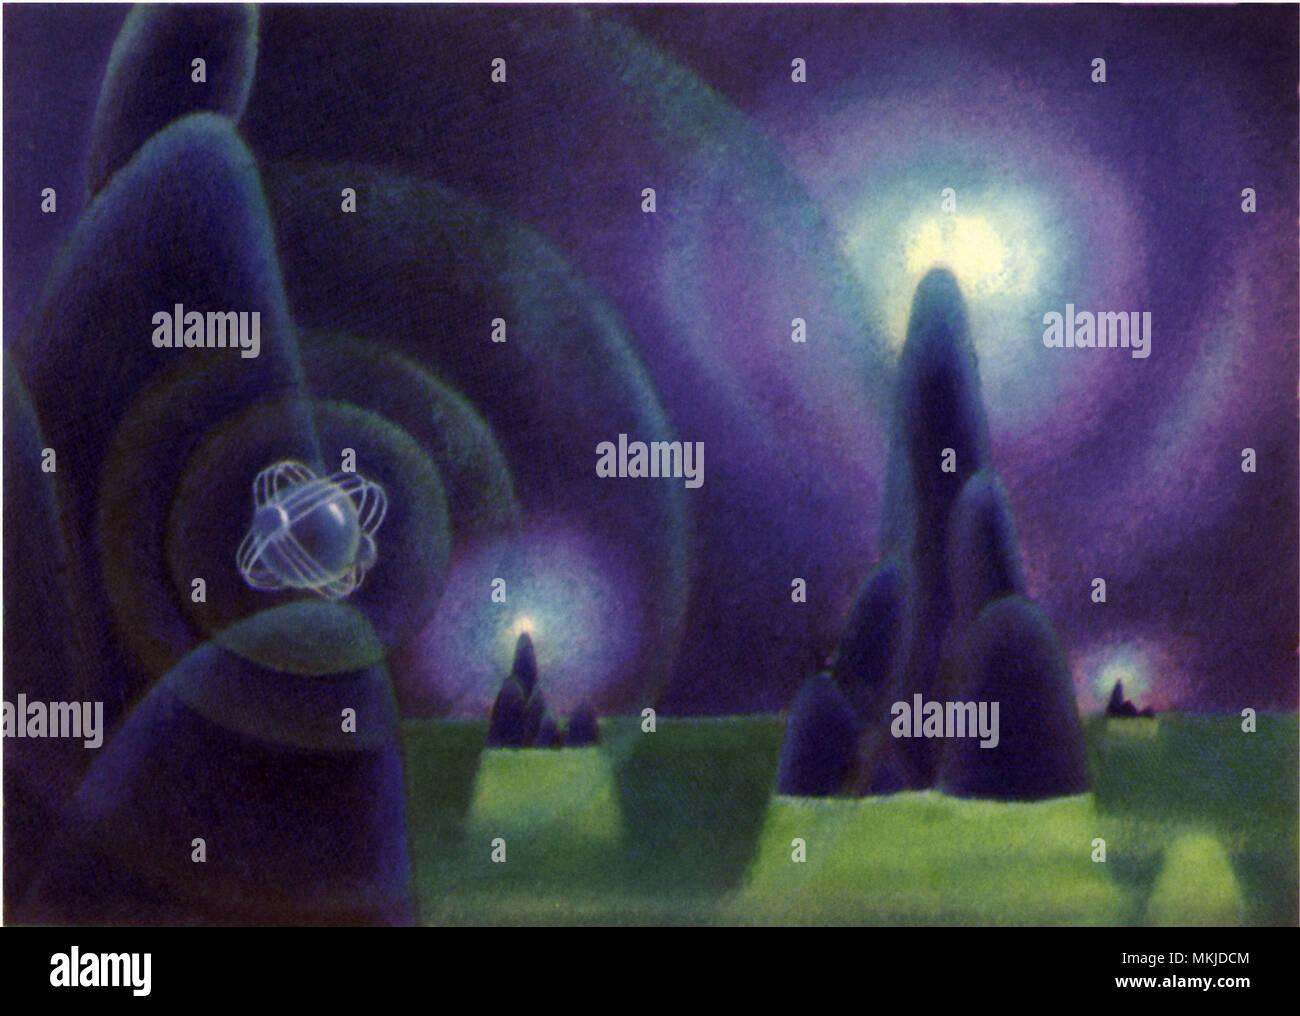 Sci Fi - Alien Planet - Stock Image